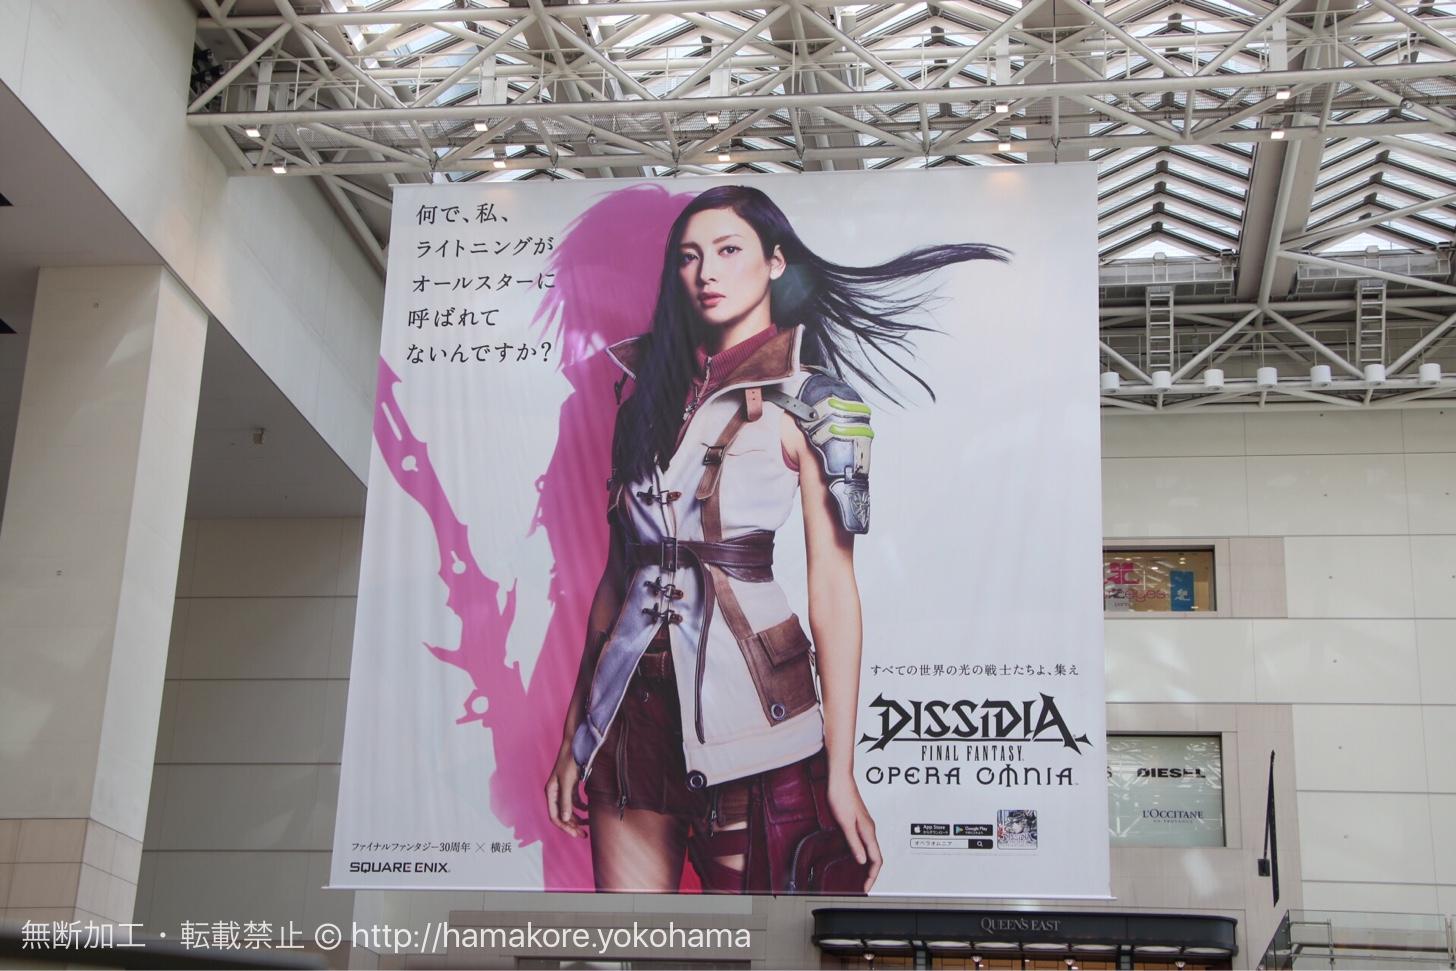 FFがクイーンズスクエア横浜の広告ジャック!巨大広告やフラッグのFFを見てきた